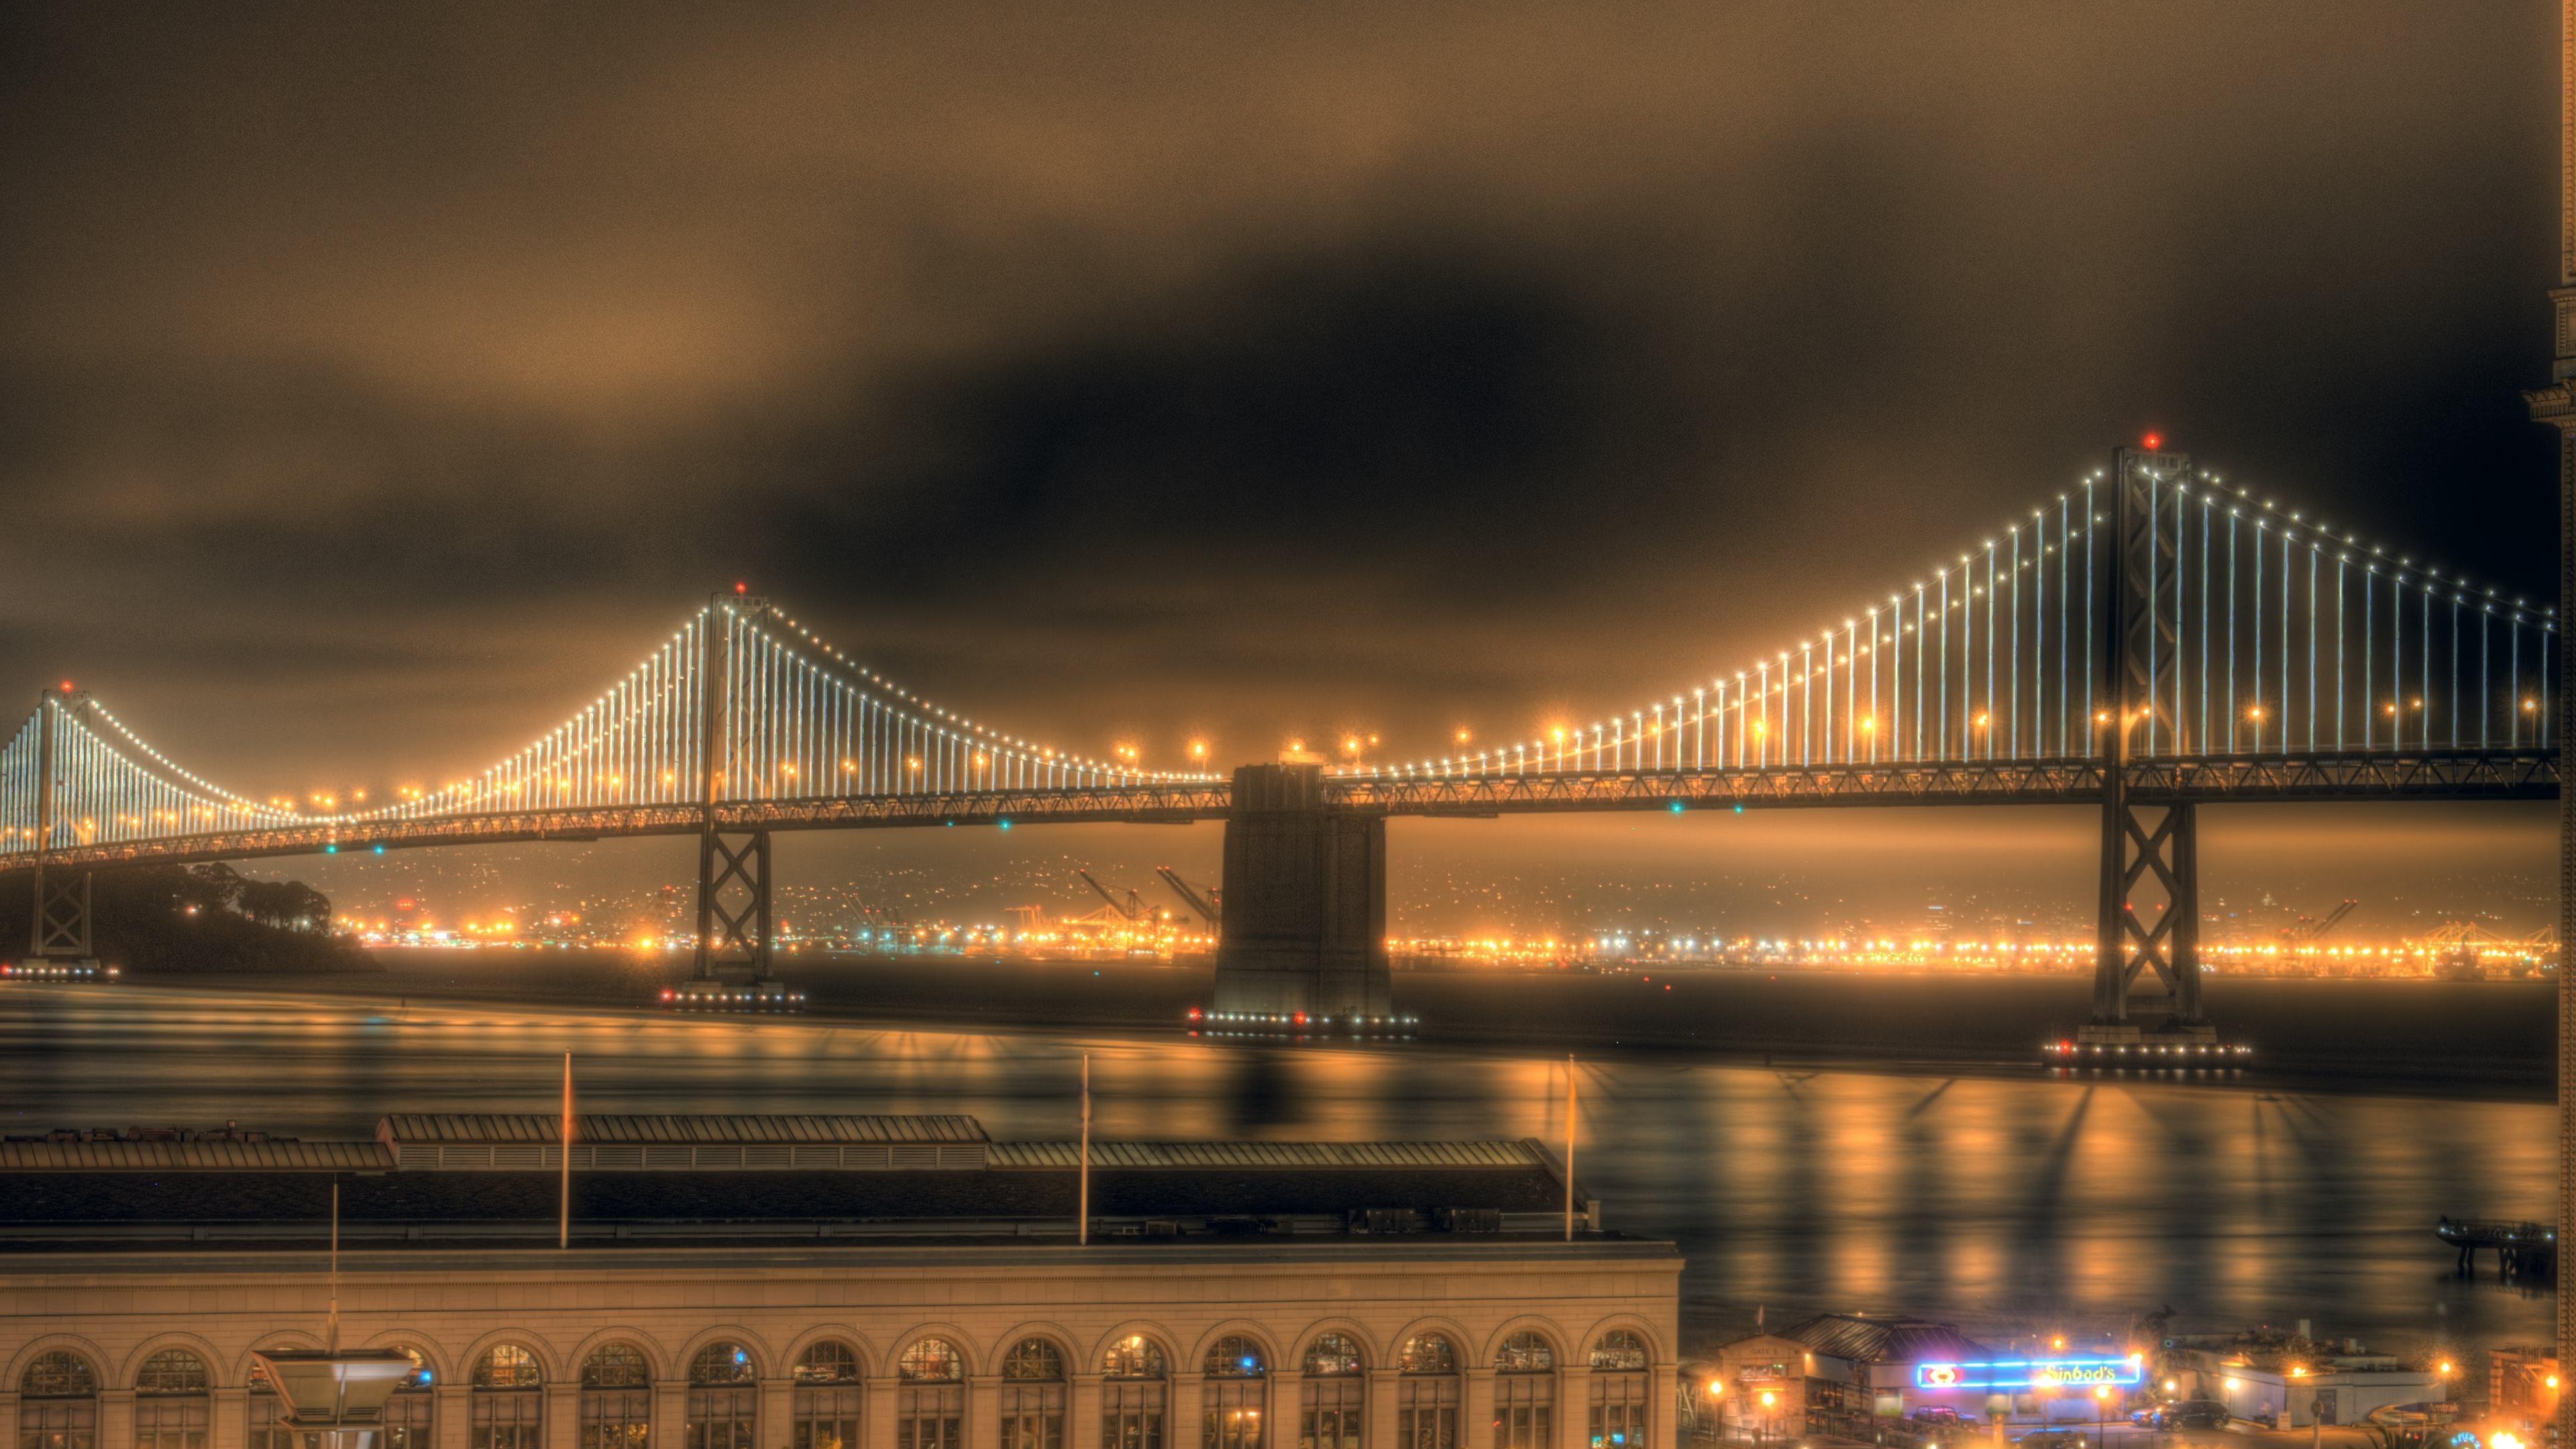 Panoramic Wallpaper Fall Bay Bridge Wallpaper Hd Pixelstalk Net